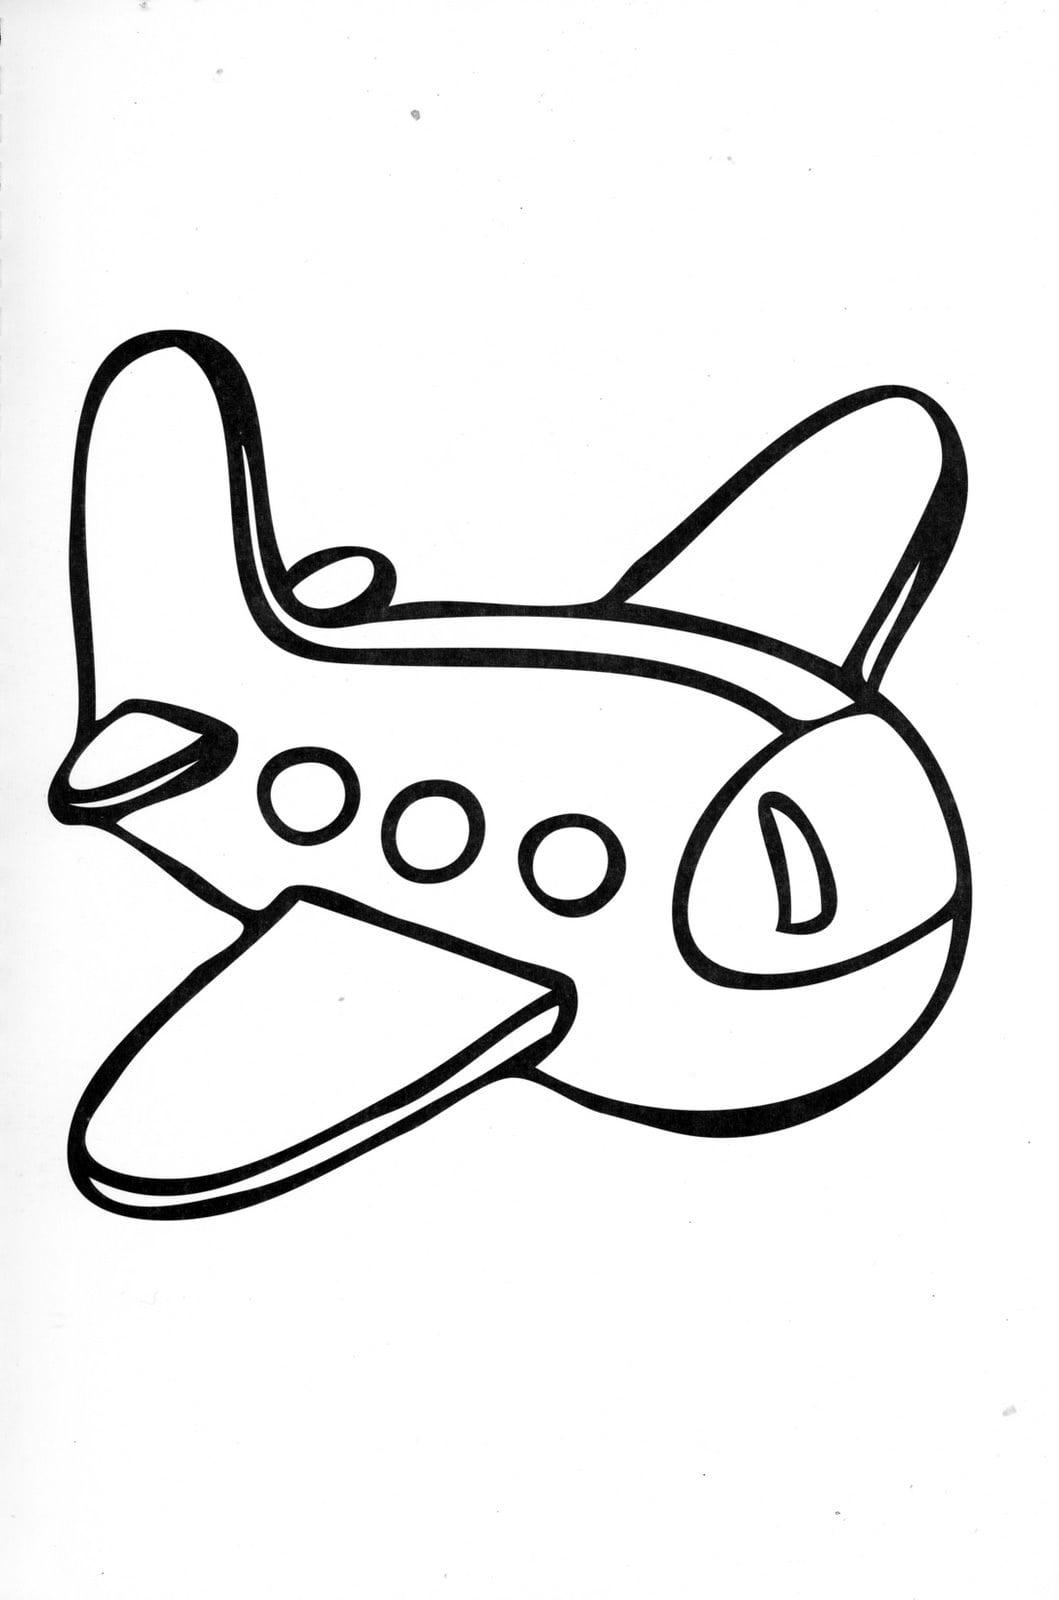 Dibujos Ideia Criativa  Meios De Transporte Pra Colorir